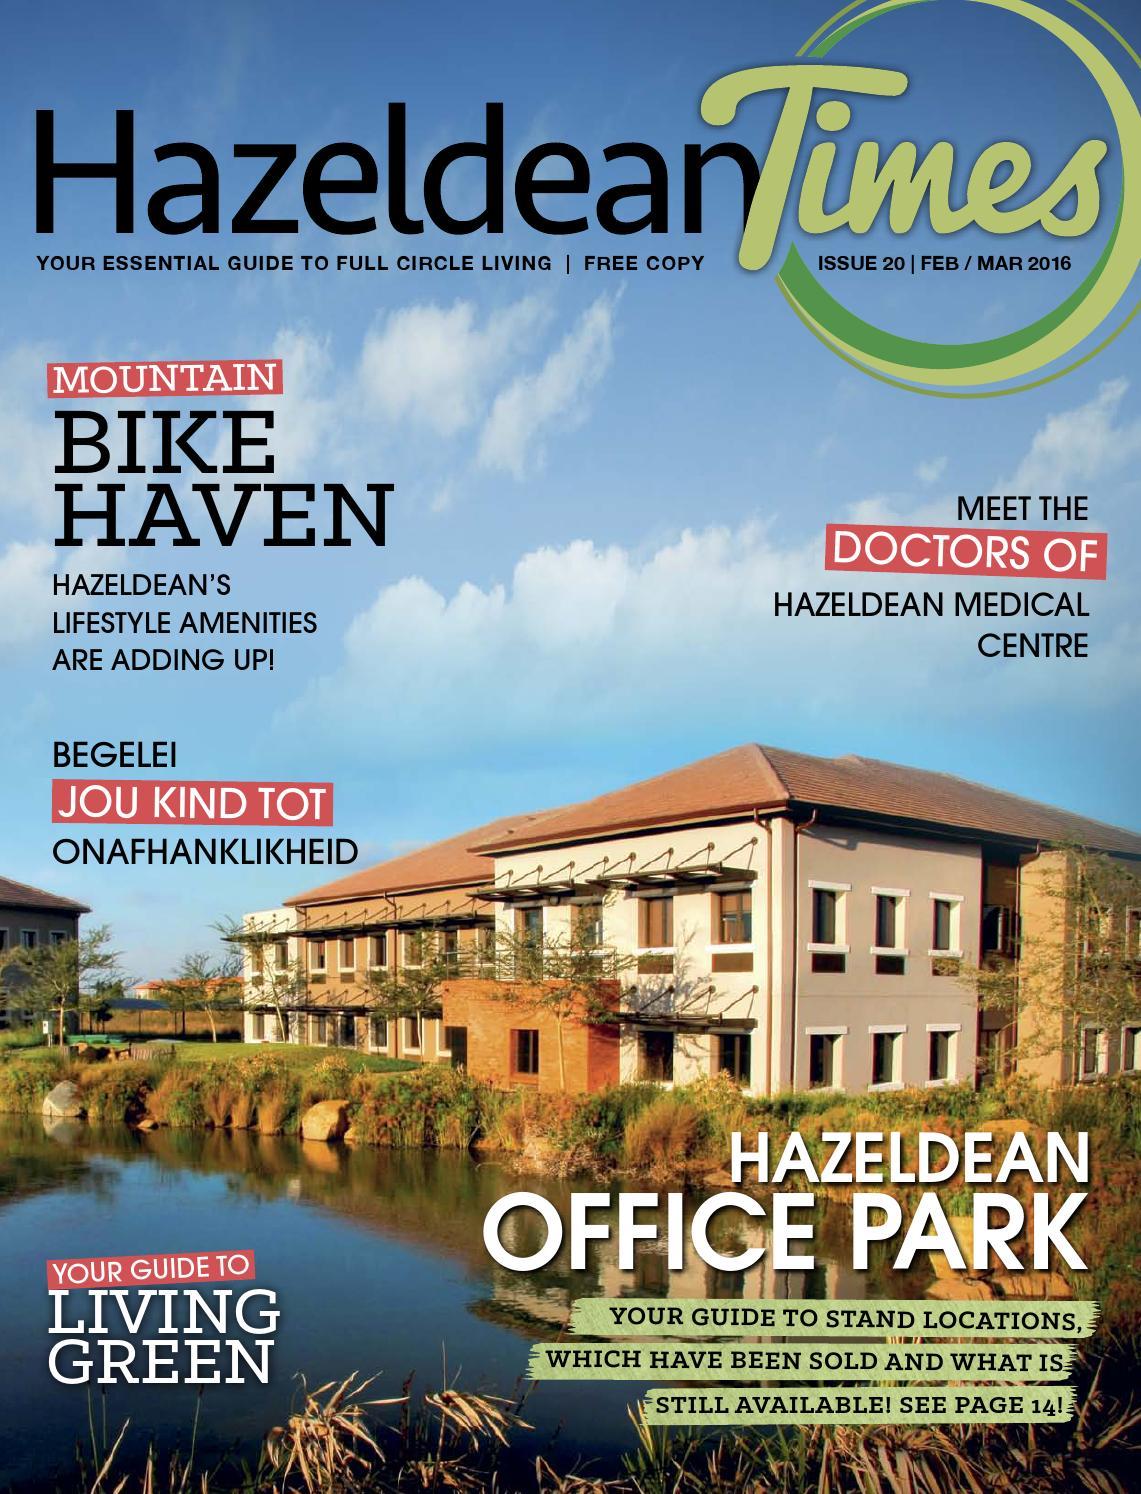 Hazeldean Times Issue 20 2016 by Abnormal Marketing - issuu